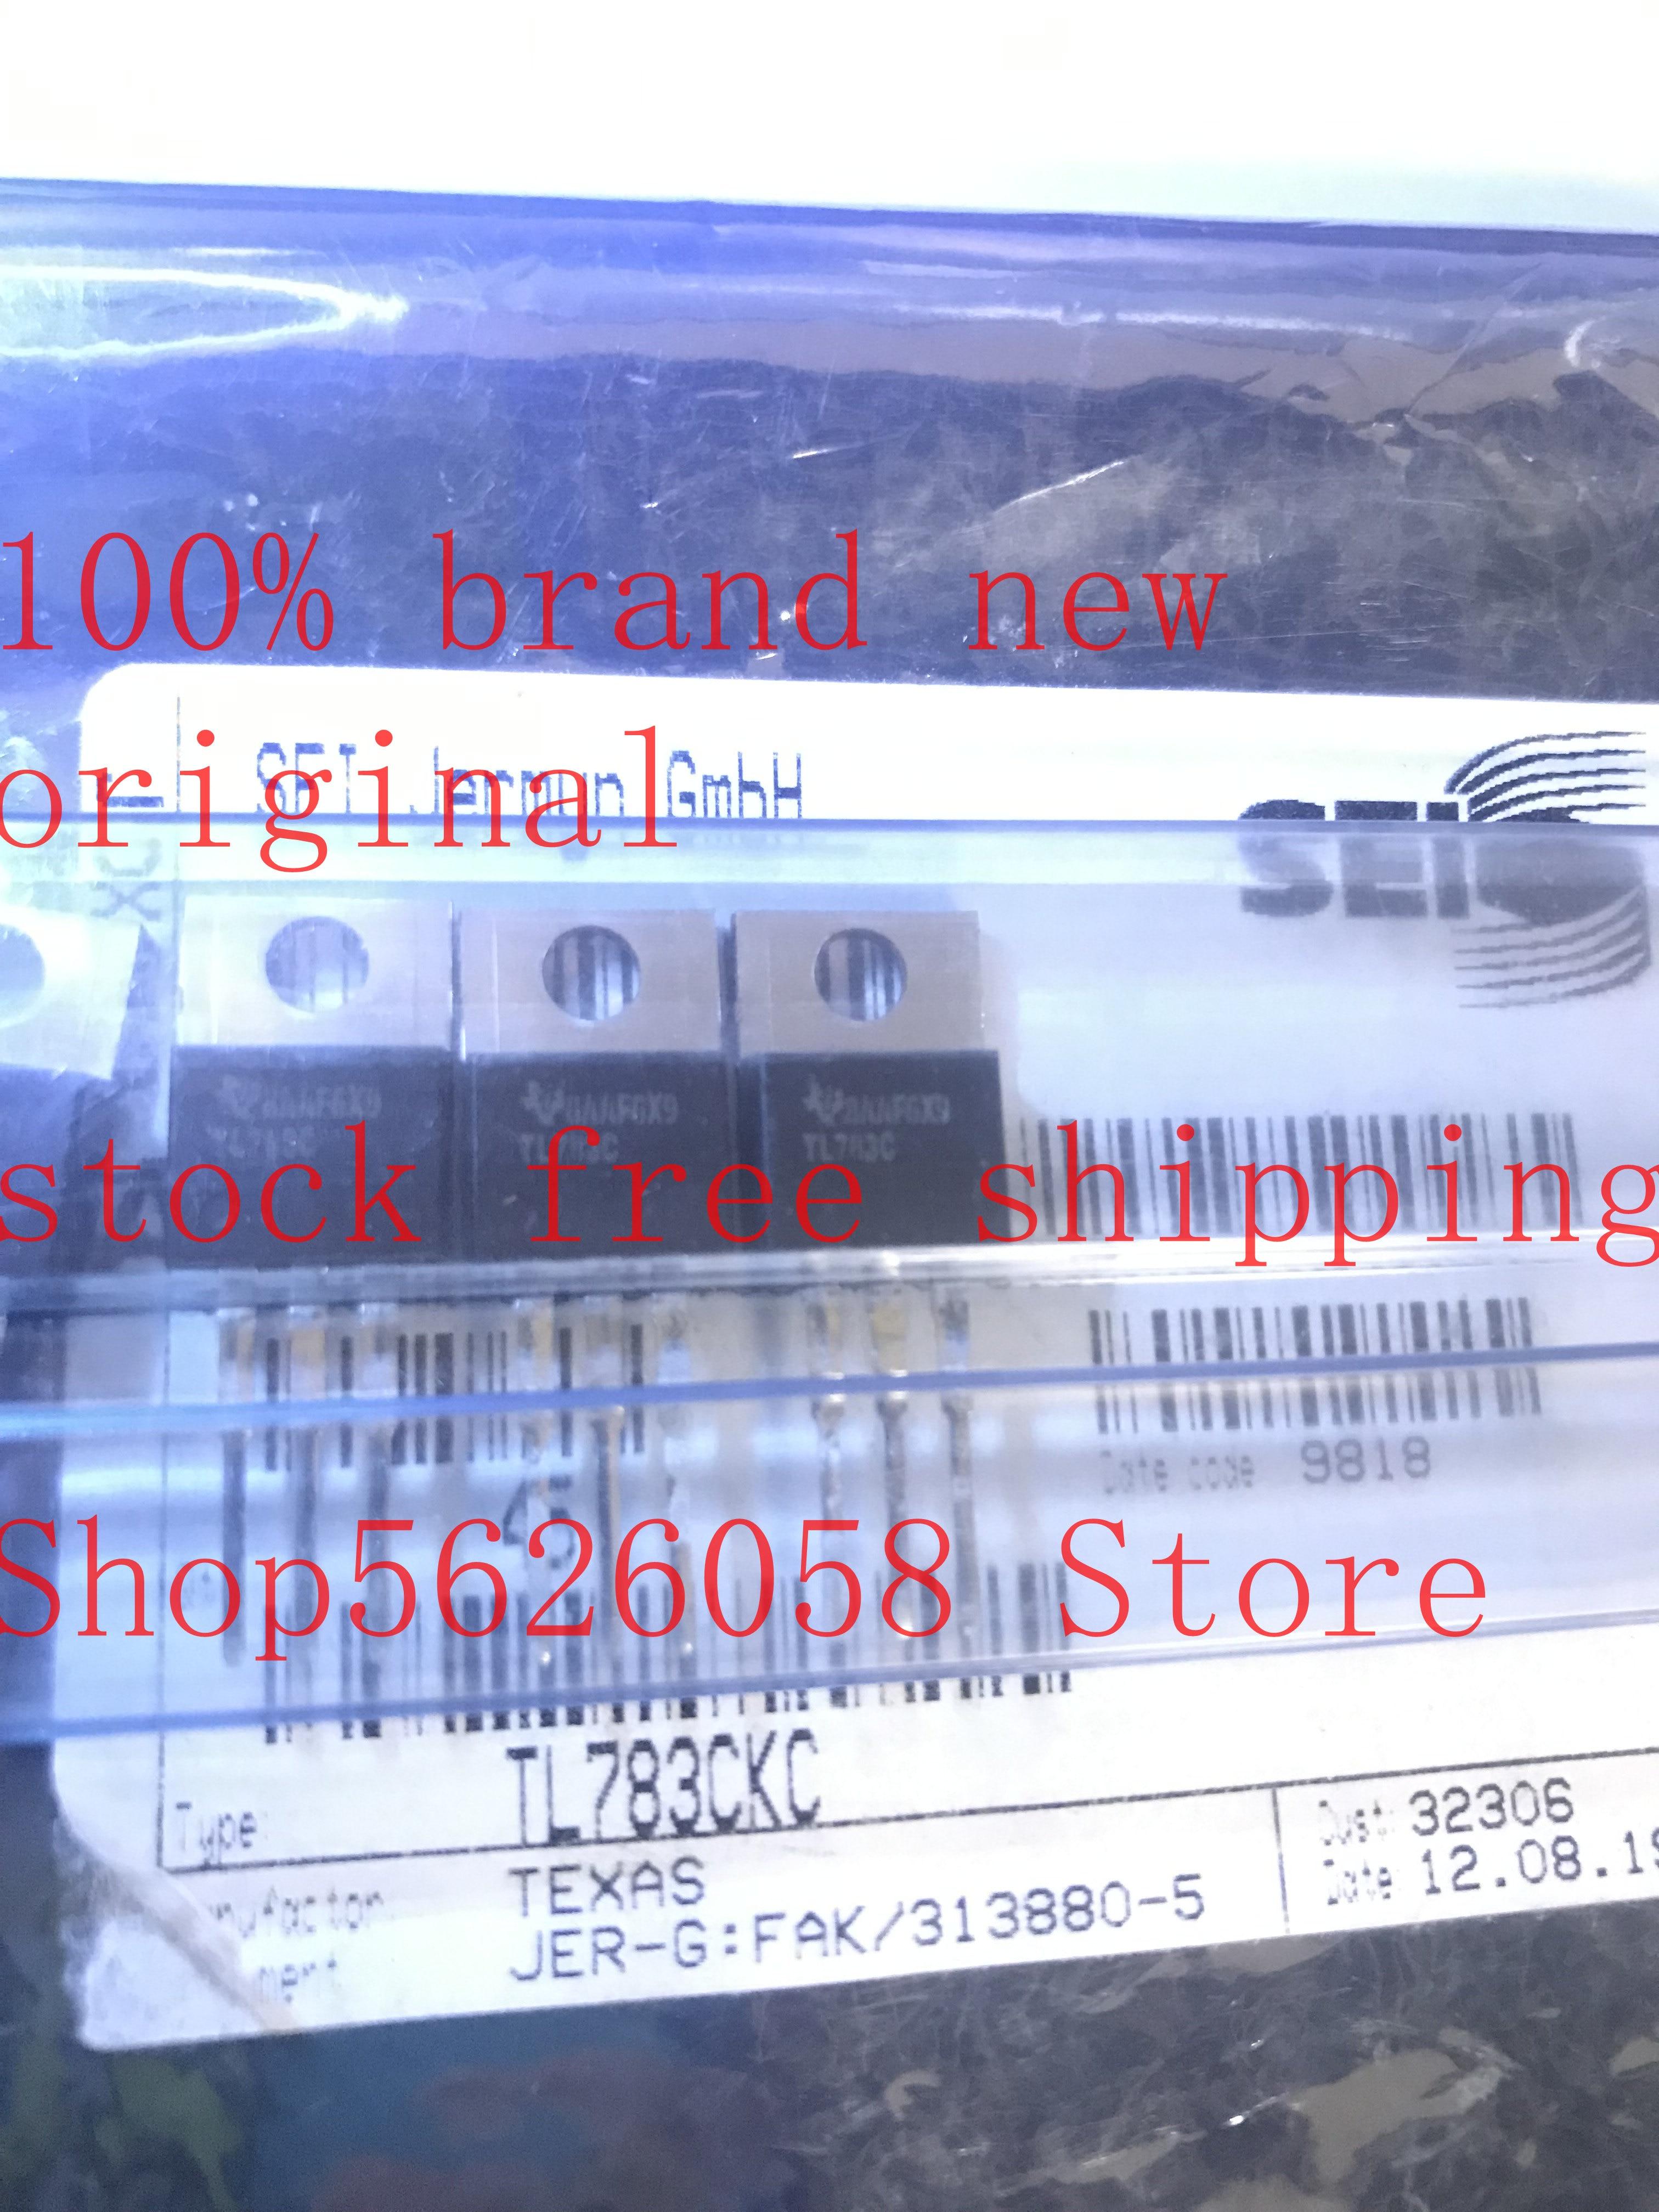 TL783CKC PARA-220 100% original novo 10PCS-500 PÇS/LOTE ESTOQUE